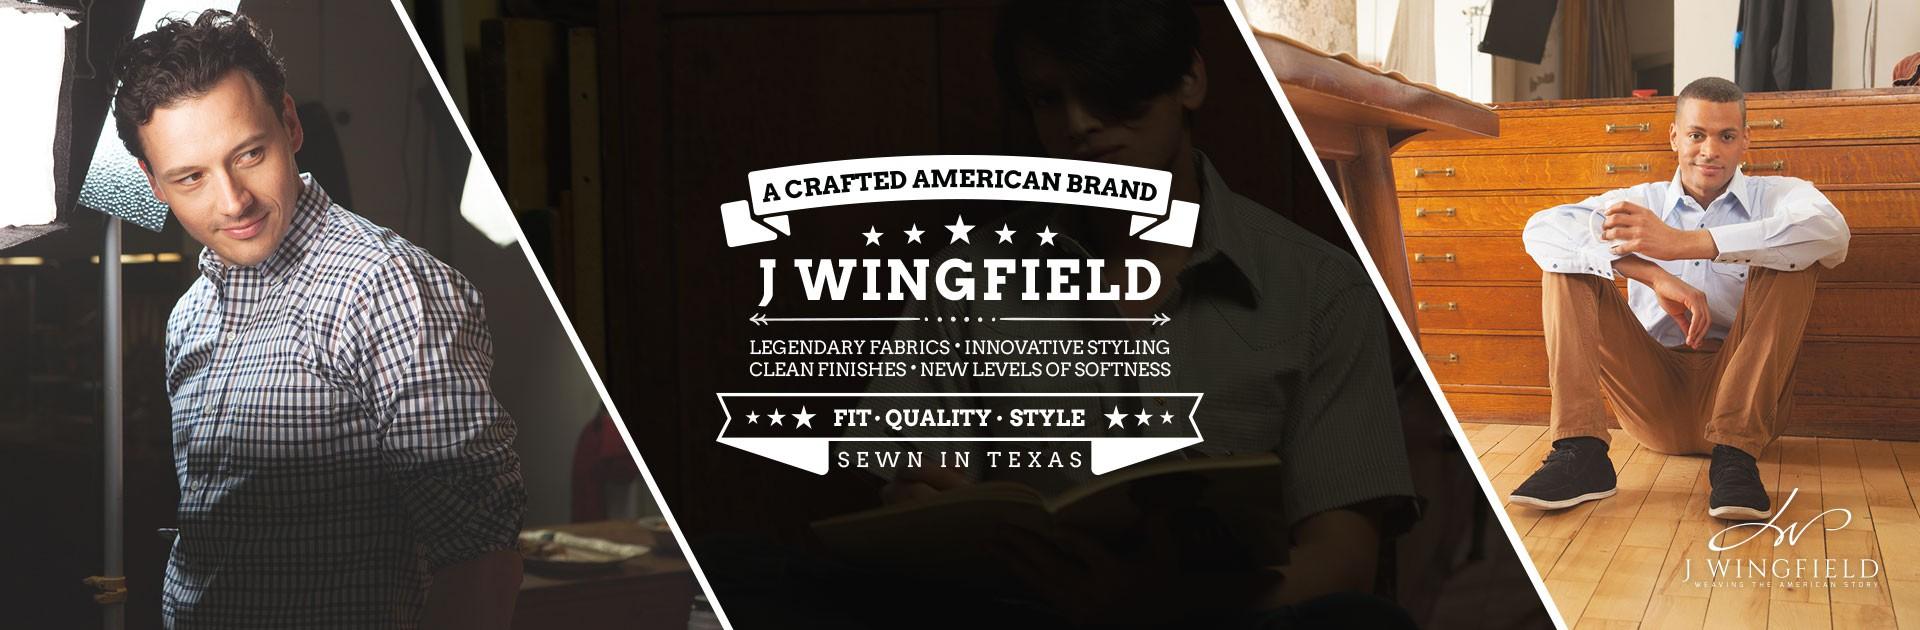 Slider designs for www.jwingfield.com